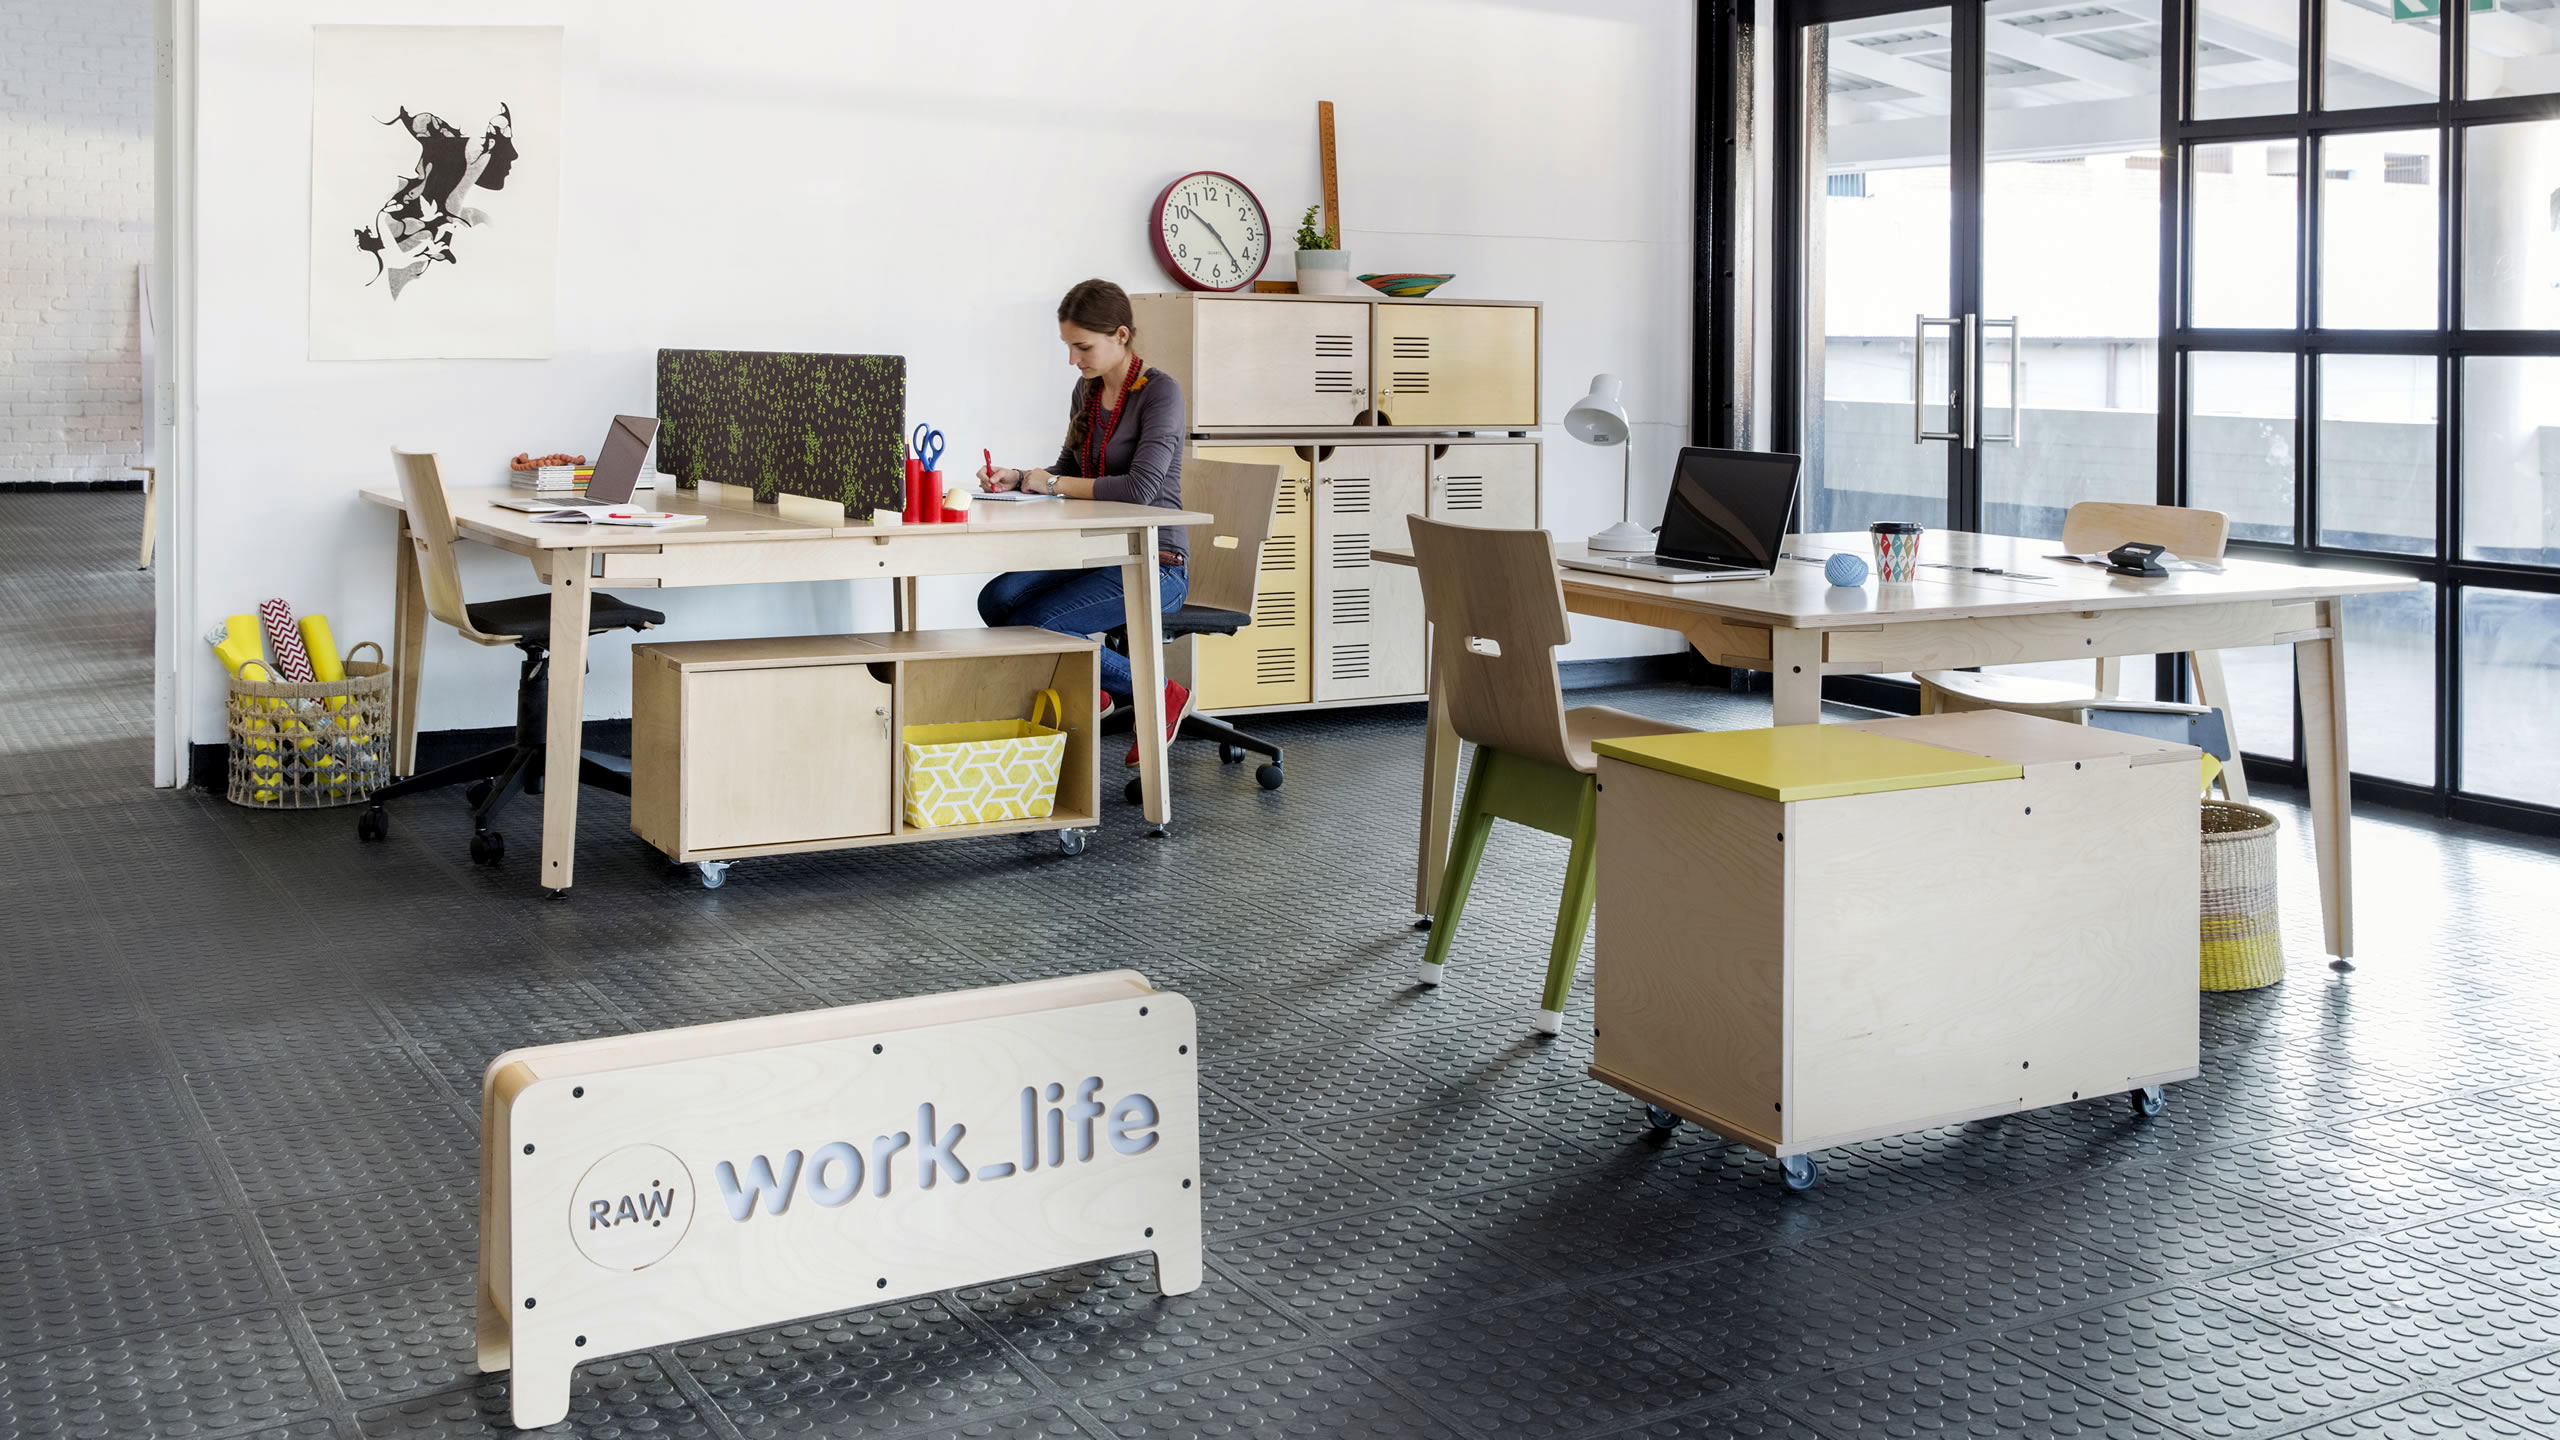 Raw Studios Worklife Office